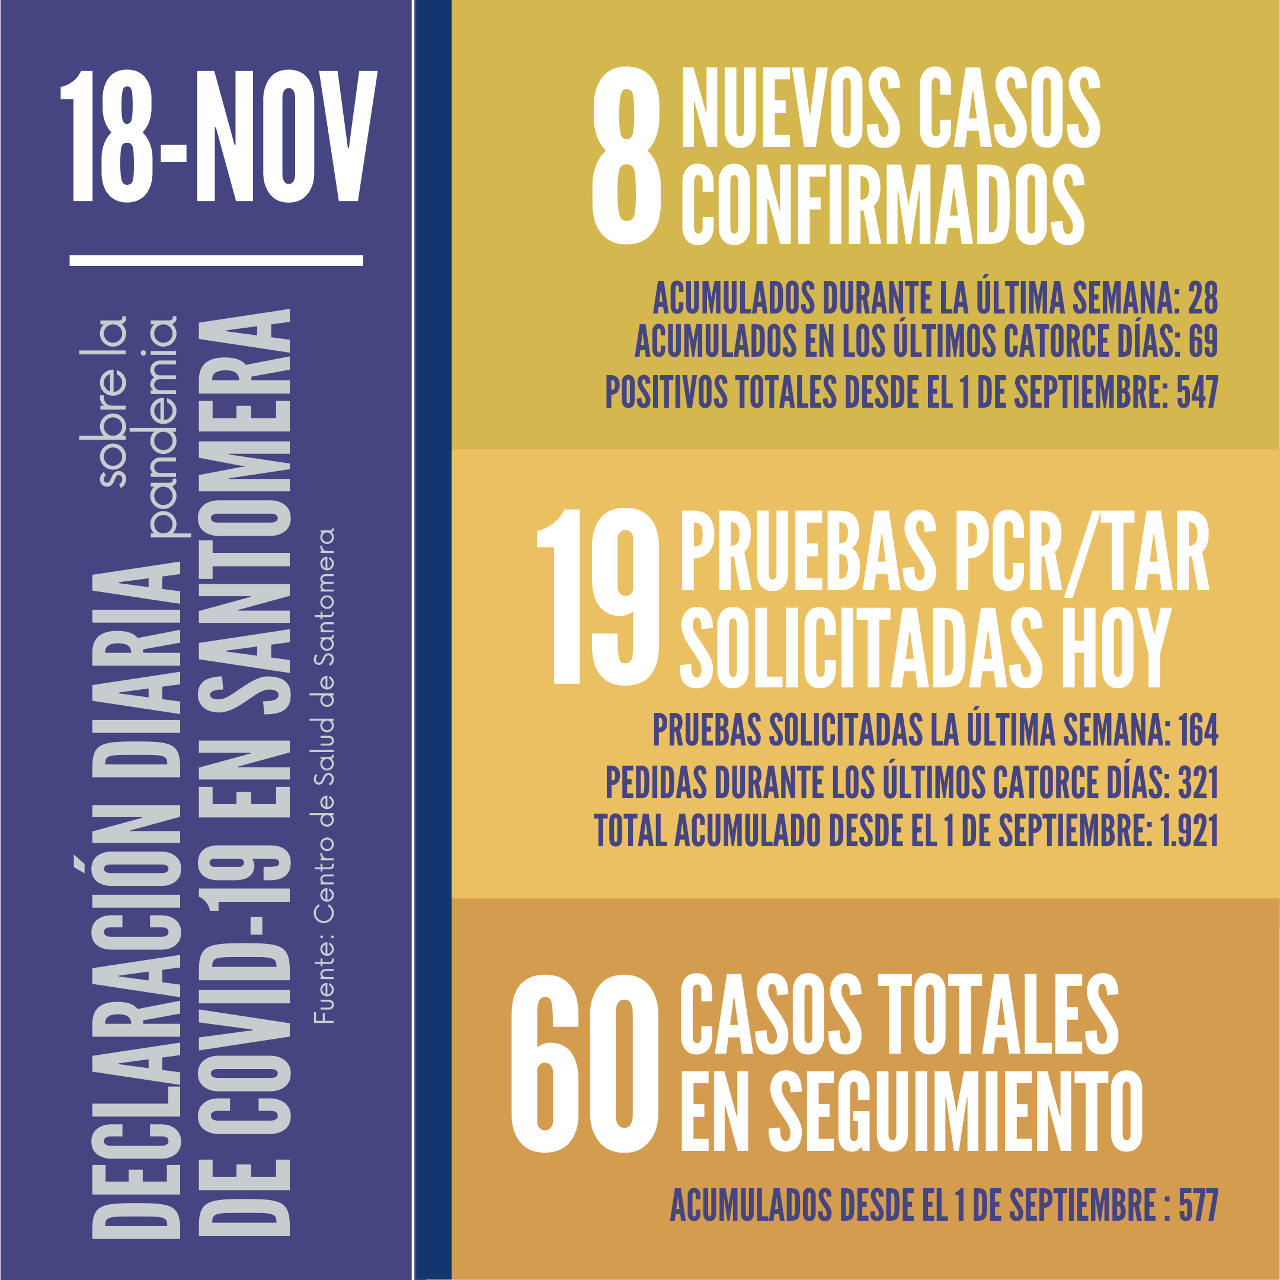 20201118_Datos COVID-19 Santomera